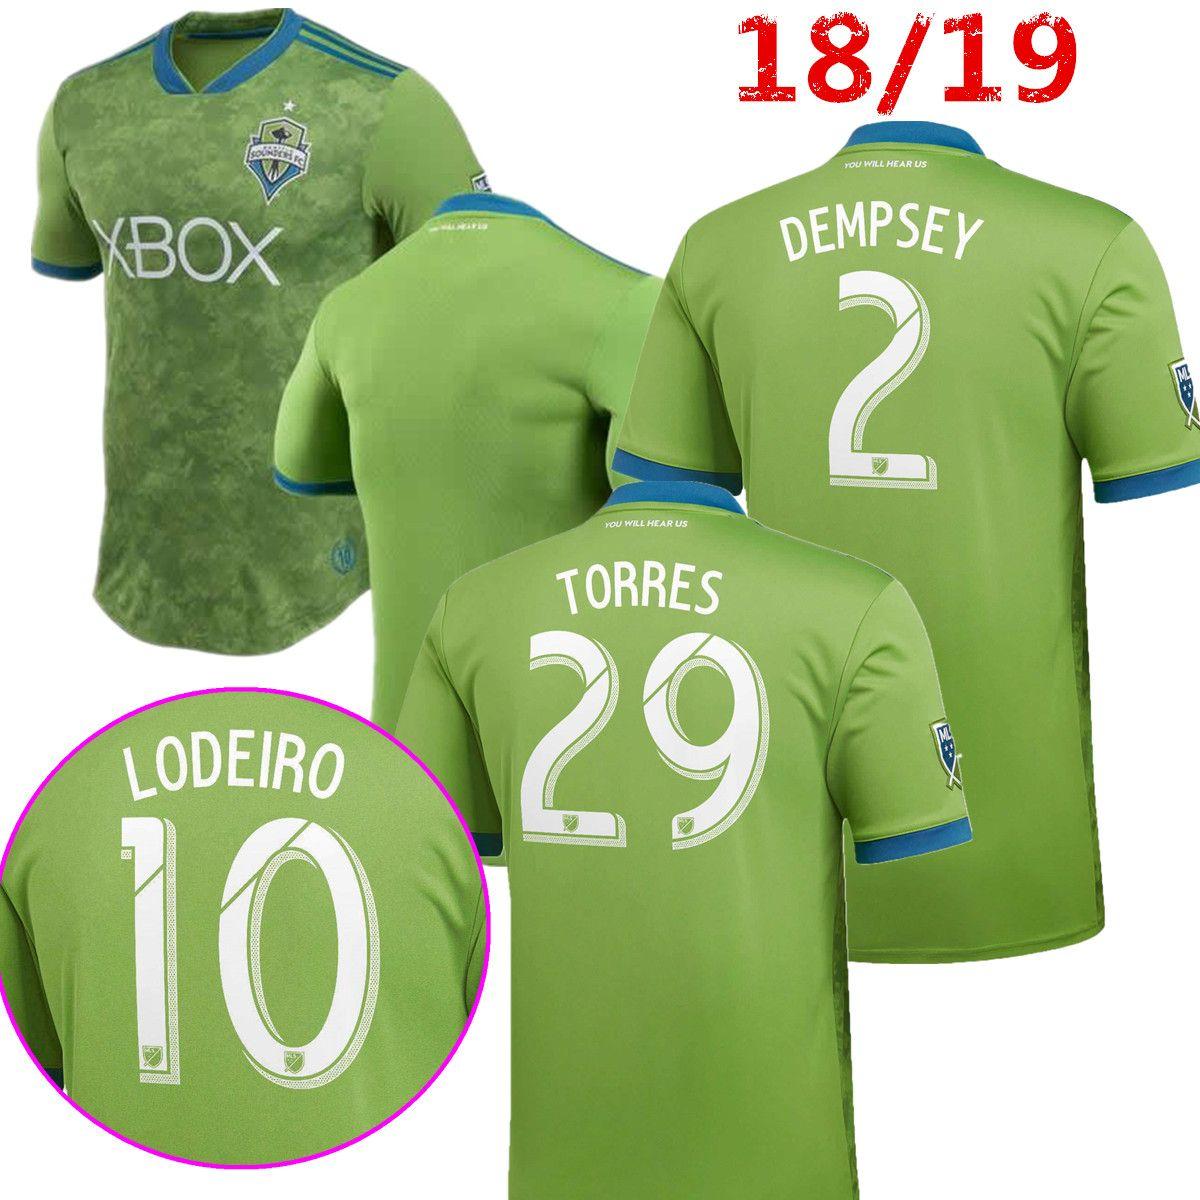 d5c4ce9f5fc61 Nueva Calidad Tailandesa 2018 2019 Green Seattle Sounders FC Camisetas De  Fútbol 18 19 MORRIS DEMPSEY TORRES Roldan Lodeiro KIT Camisetas De Camiseta  De ...